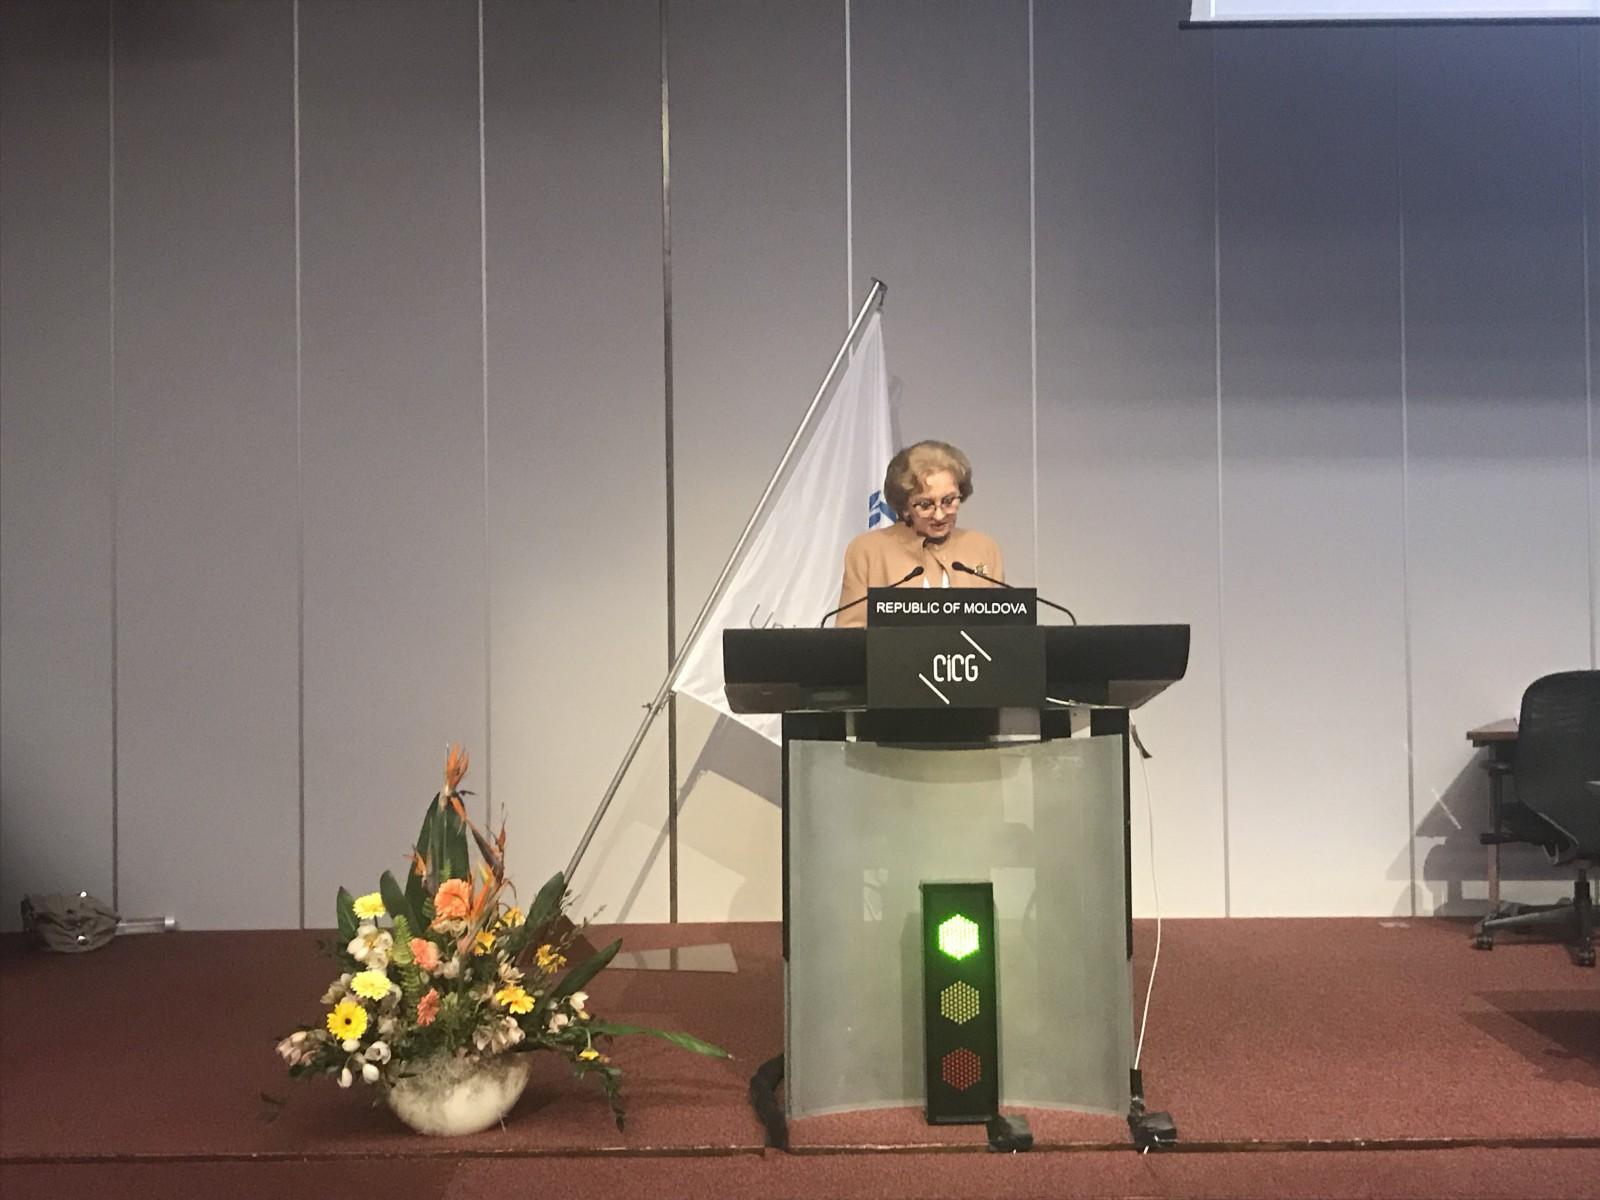 Zinaida Greceanîi a participat la cea de-a 138-a Adunare a Uniunii Interparlamentare